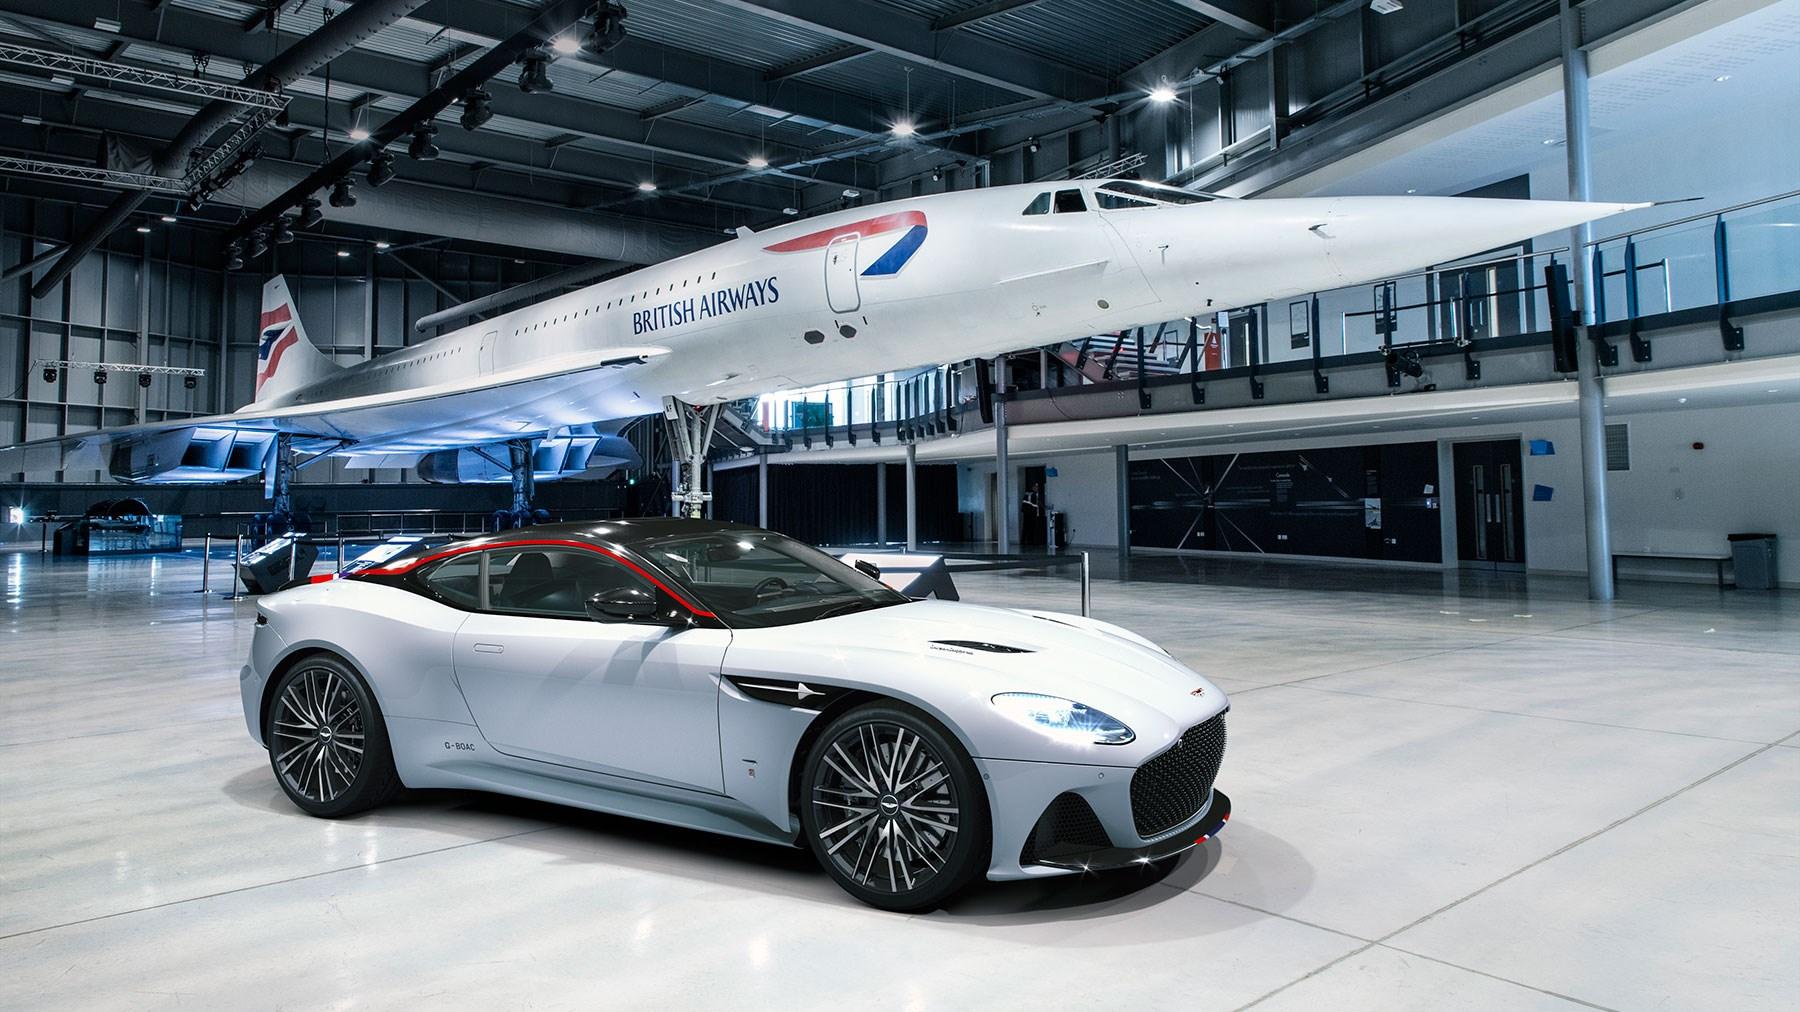 Aston Martin Dbs Superleggera Concorde A Supersonic Special Edition Car Magazine